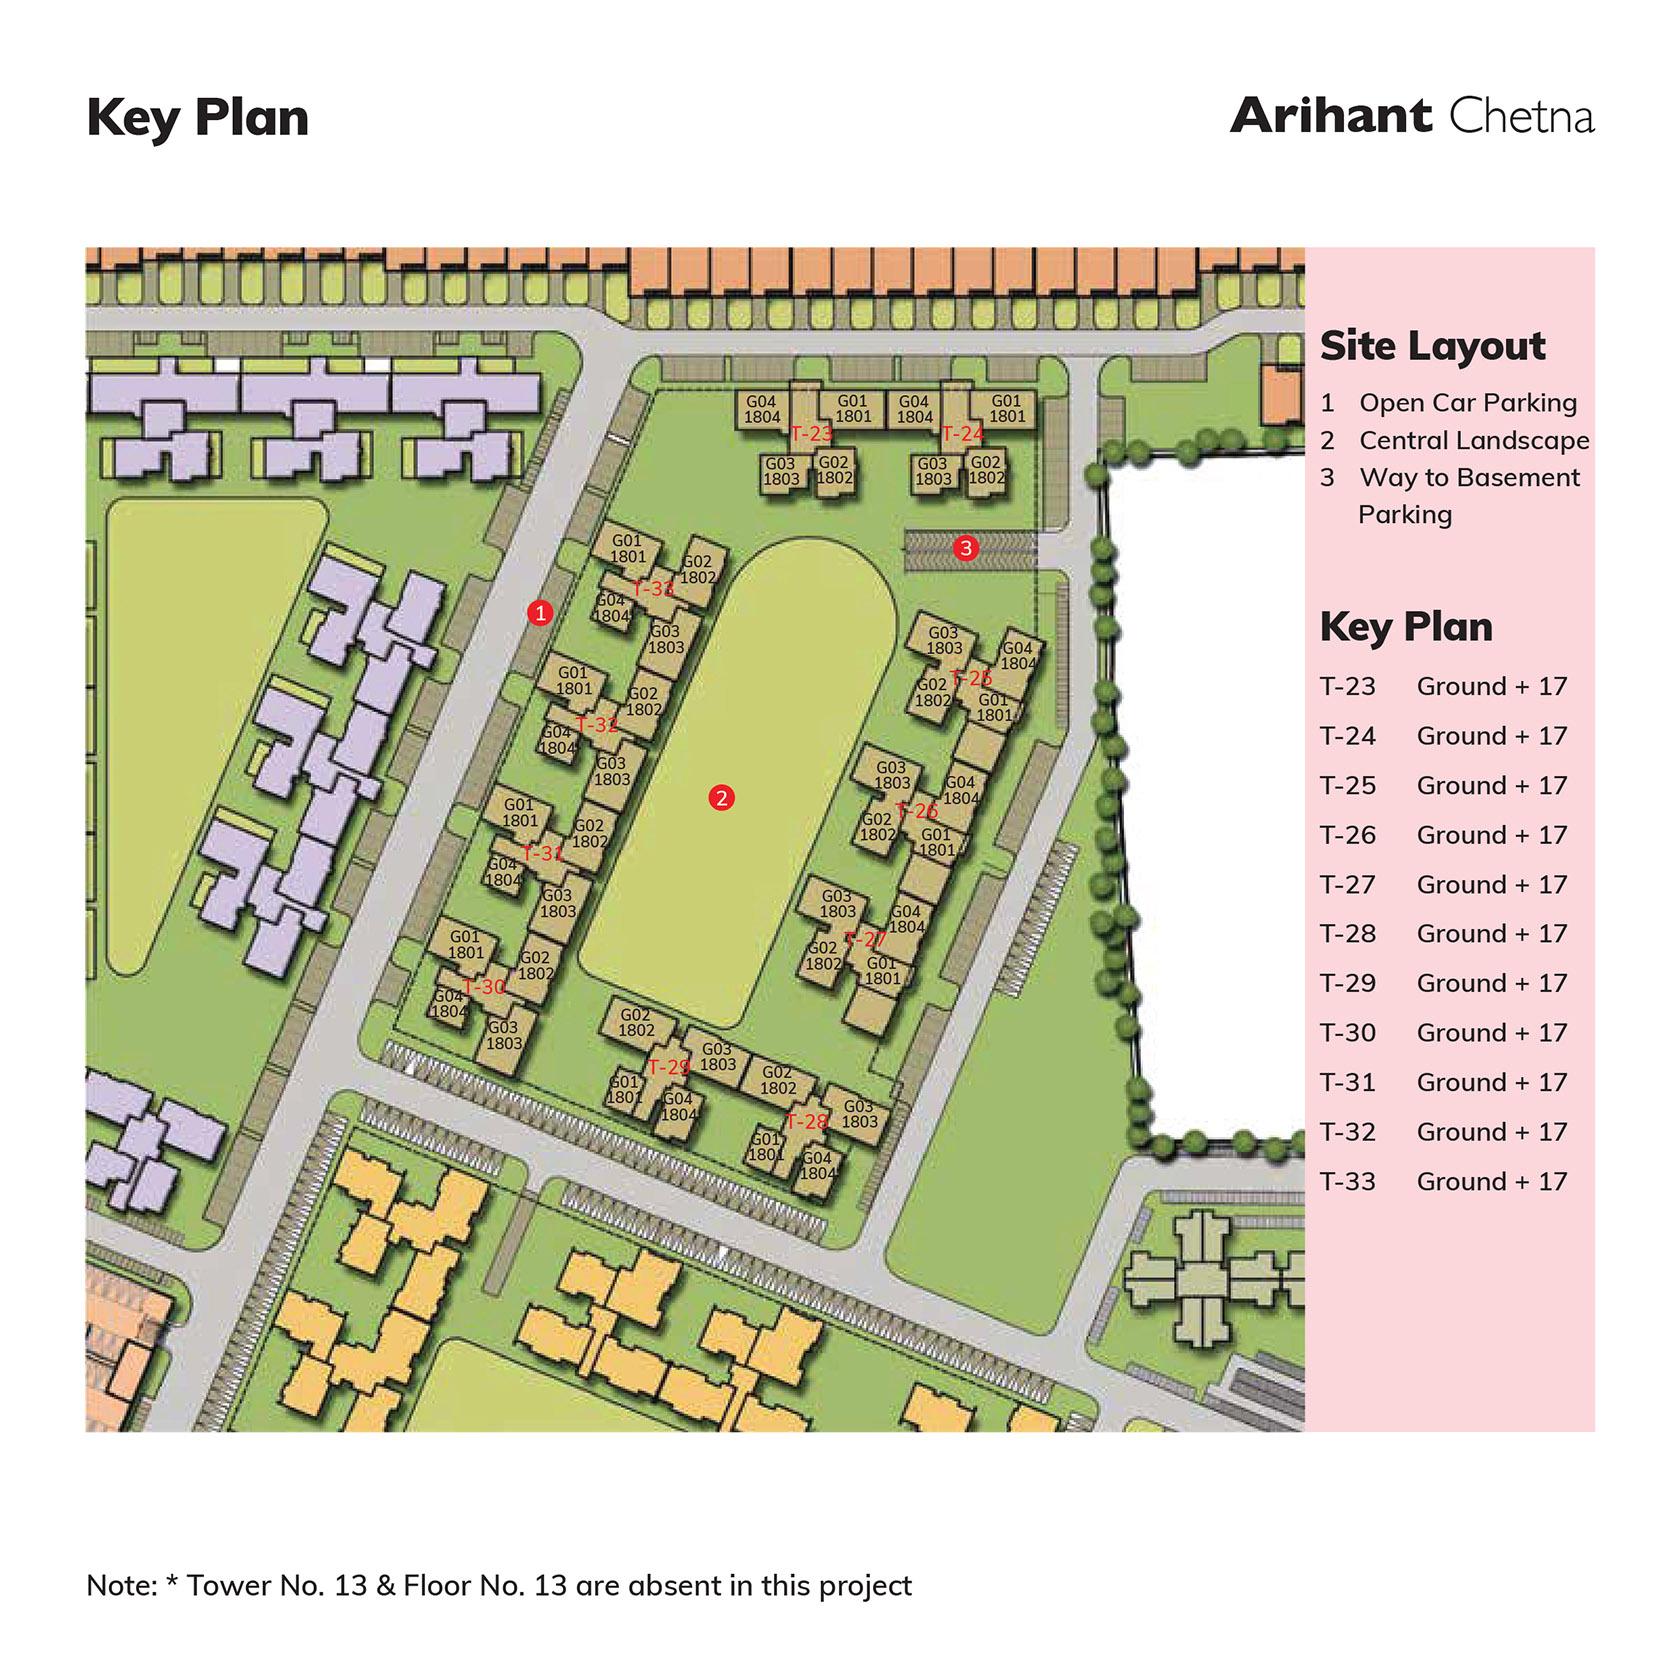 Arihant Chetna Key Plan